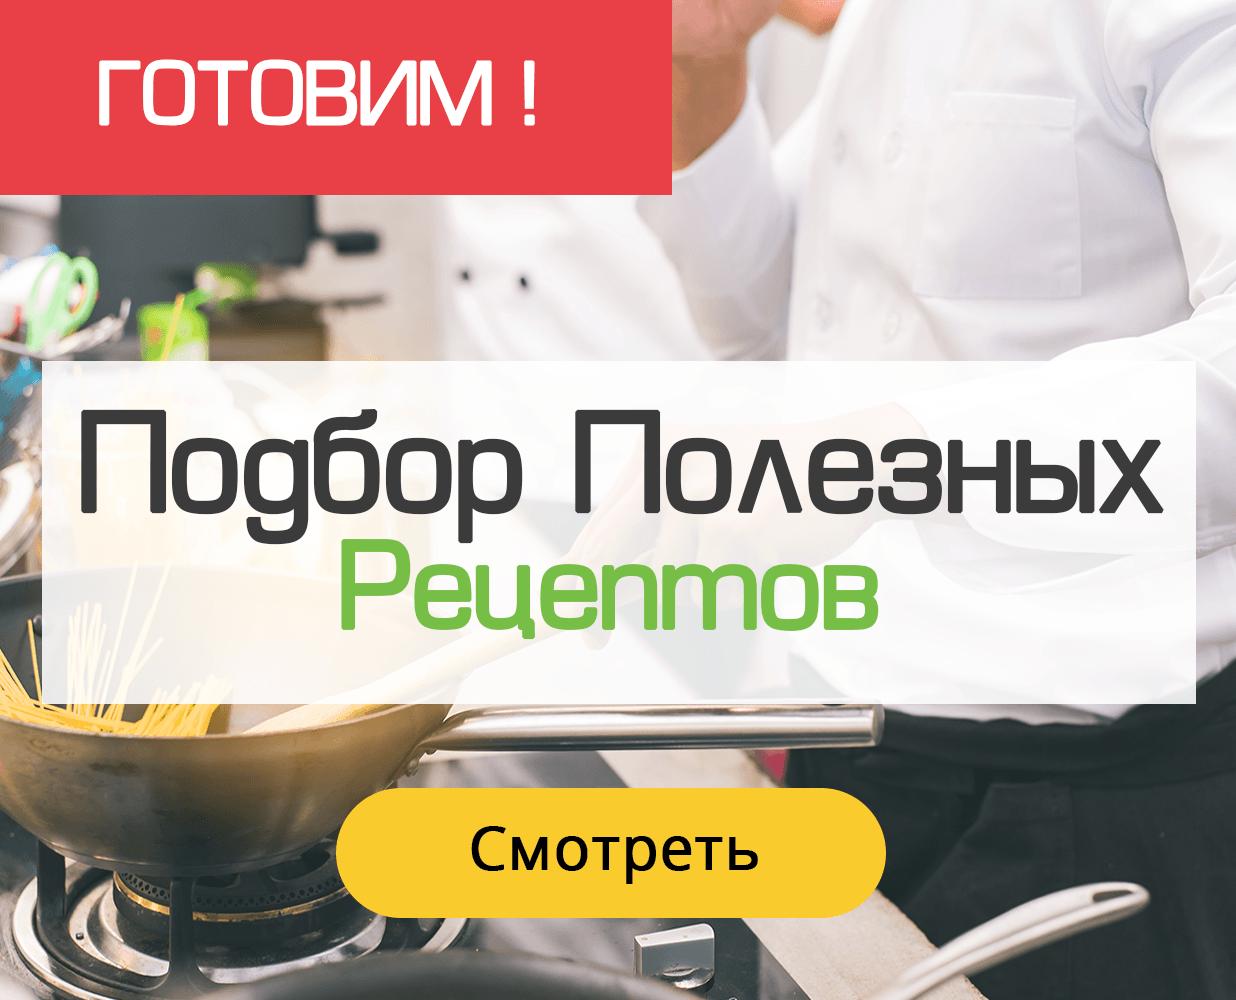 рецепты, пп, зож, гербалайф рецепты